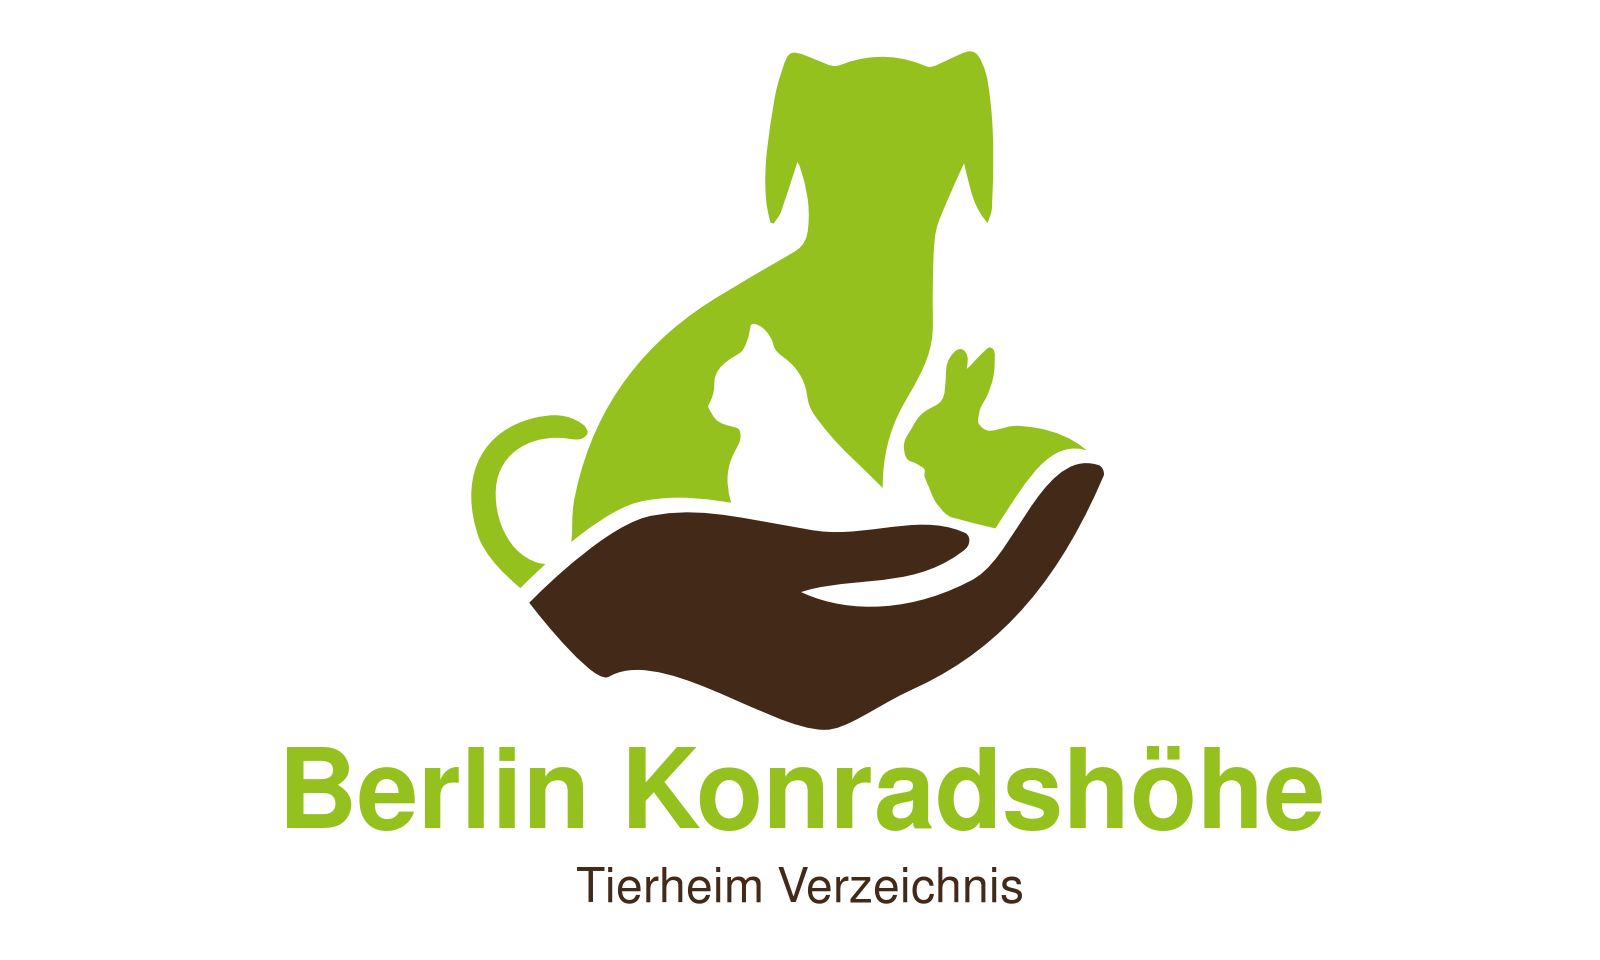 Tierheim Berlin Konradshöhe